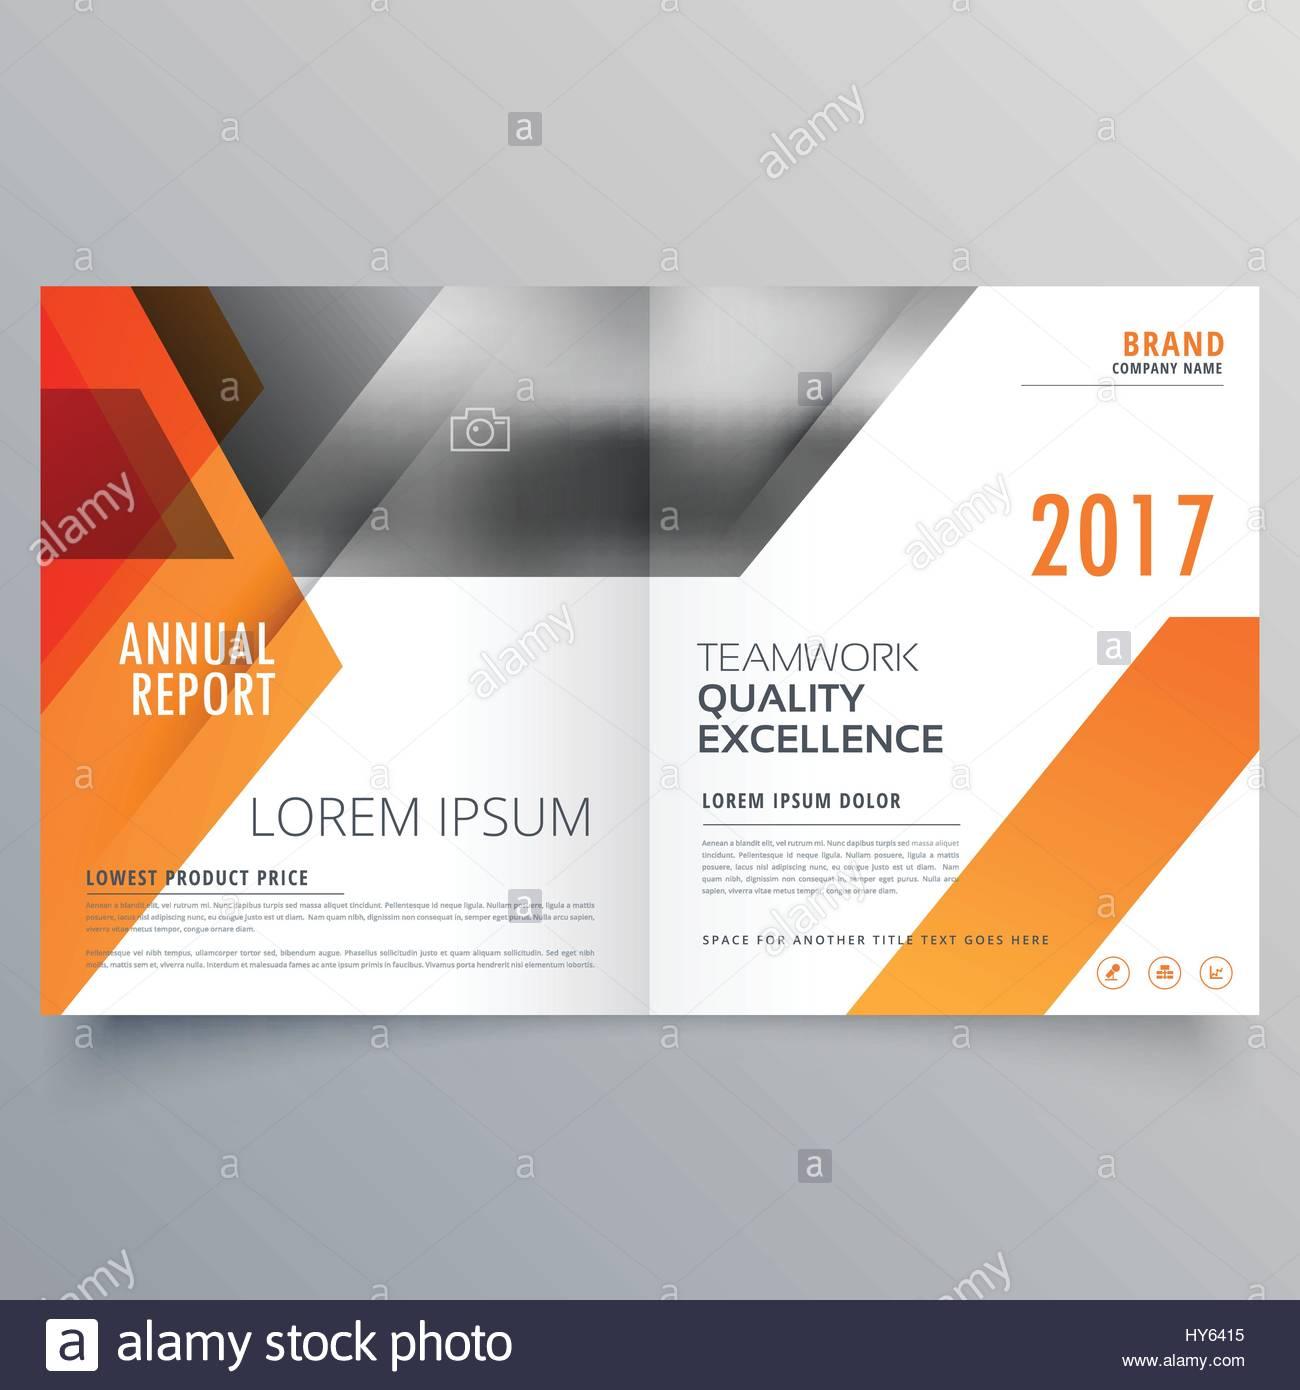 Brand Magazine Cover Page Design Or Bifold Brochure Template Vector - Bifold brochure template